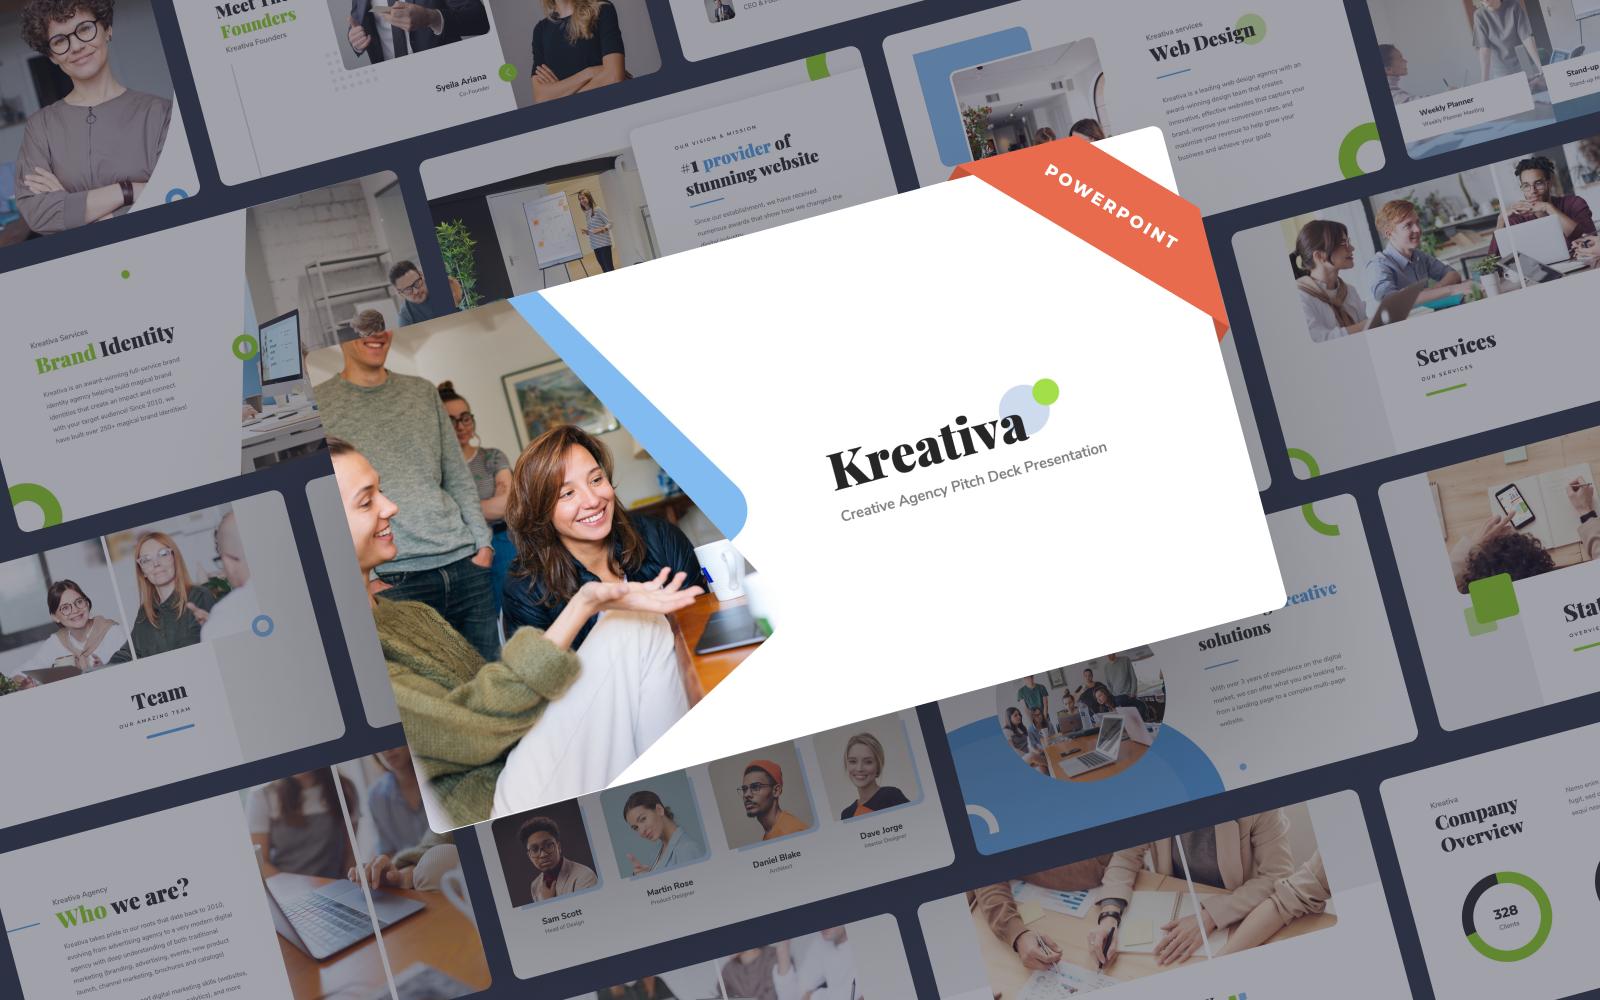 Kreativa - Creative Agency Presentation PowerPoint Template